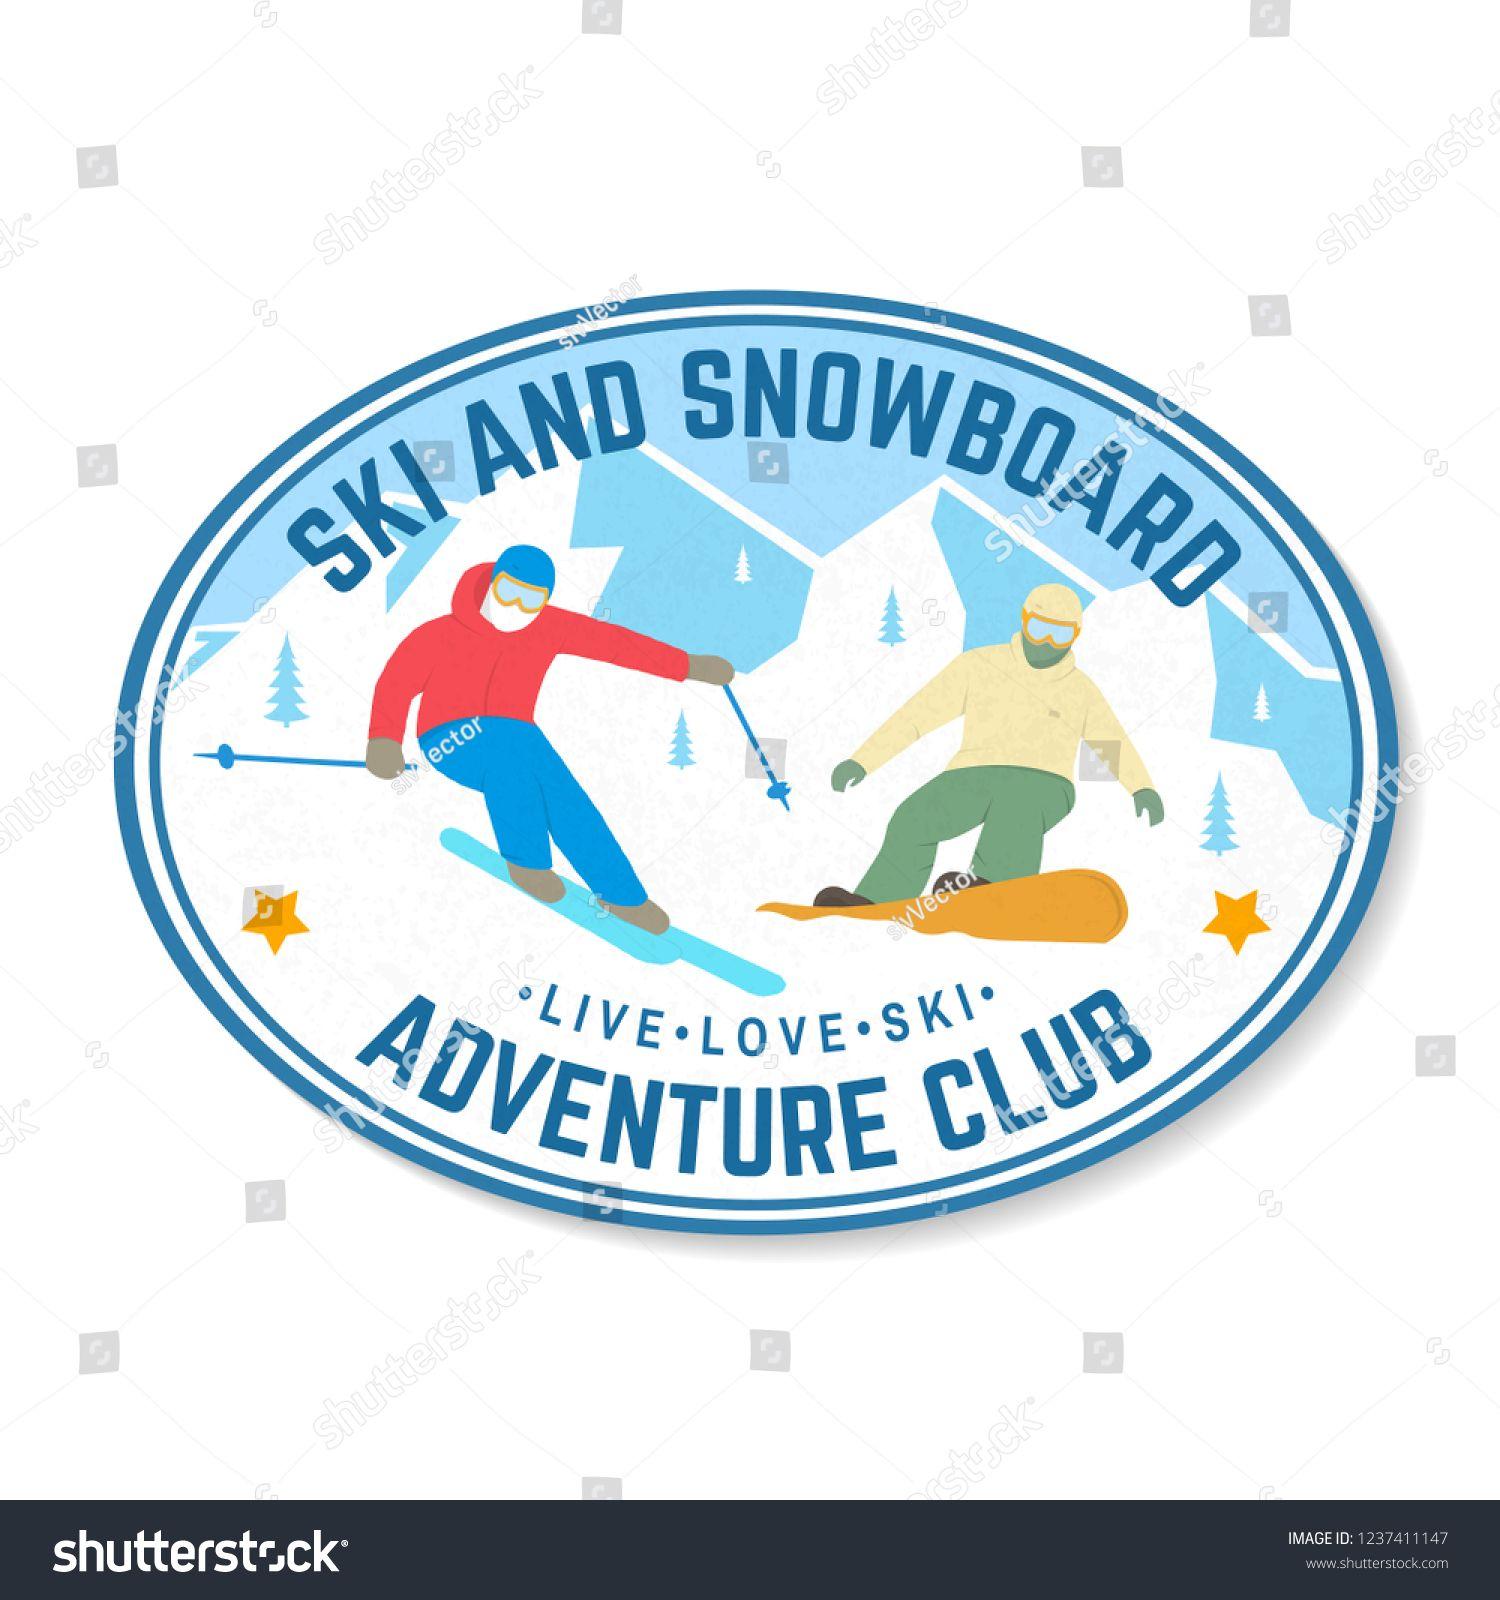 Ski And Snowboard Club Vector Illustration Concept For Shirt Print Stamp Badge Or Tee Vi Vintage Typography Design Winter Extreme Website Template Design